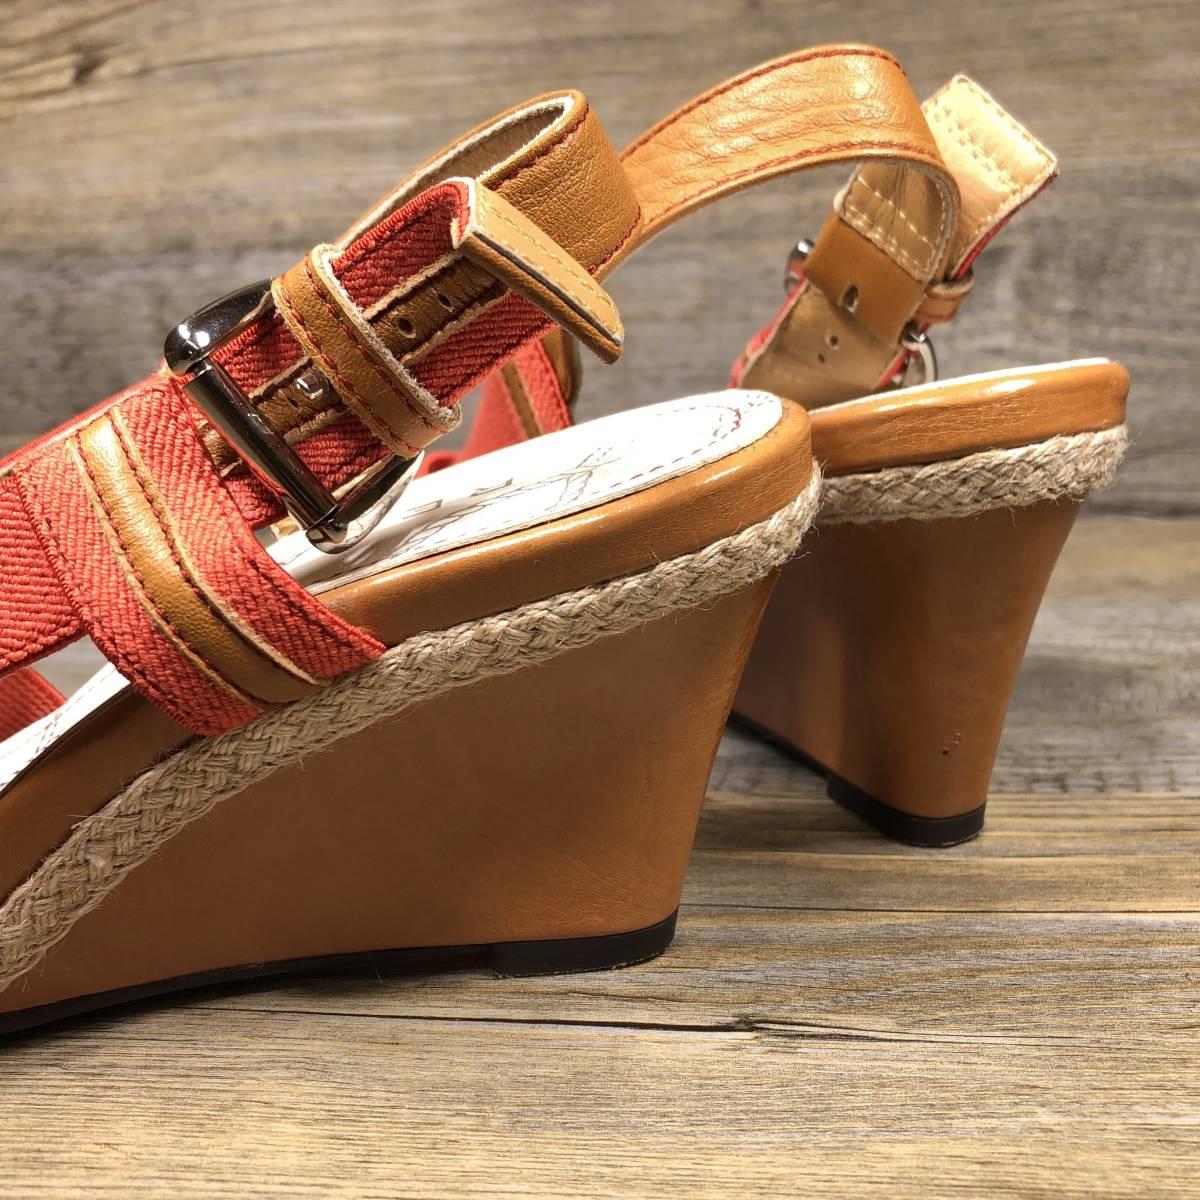 ■REGAL■ 23cm オレンジ リーガル サンダル レディース ウェッジソール 靴 くつ 中古 宅急便 即決_画像6